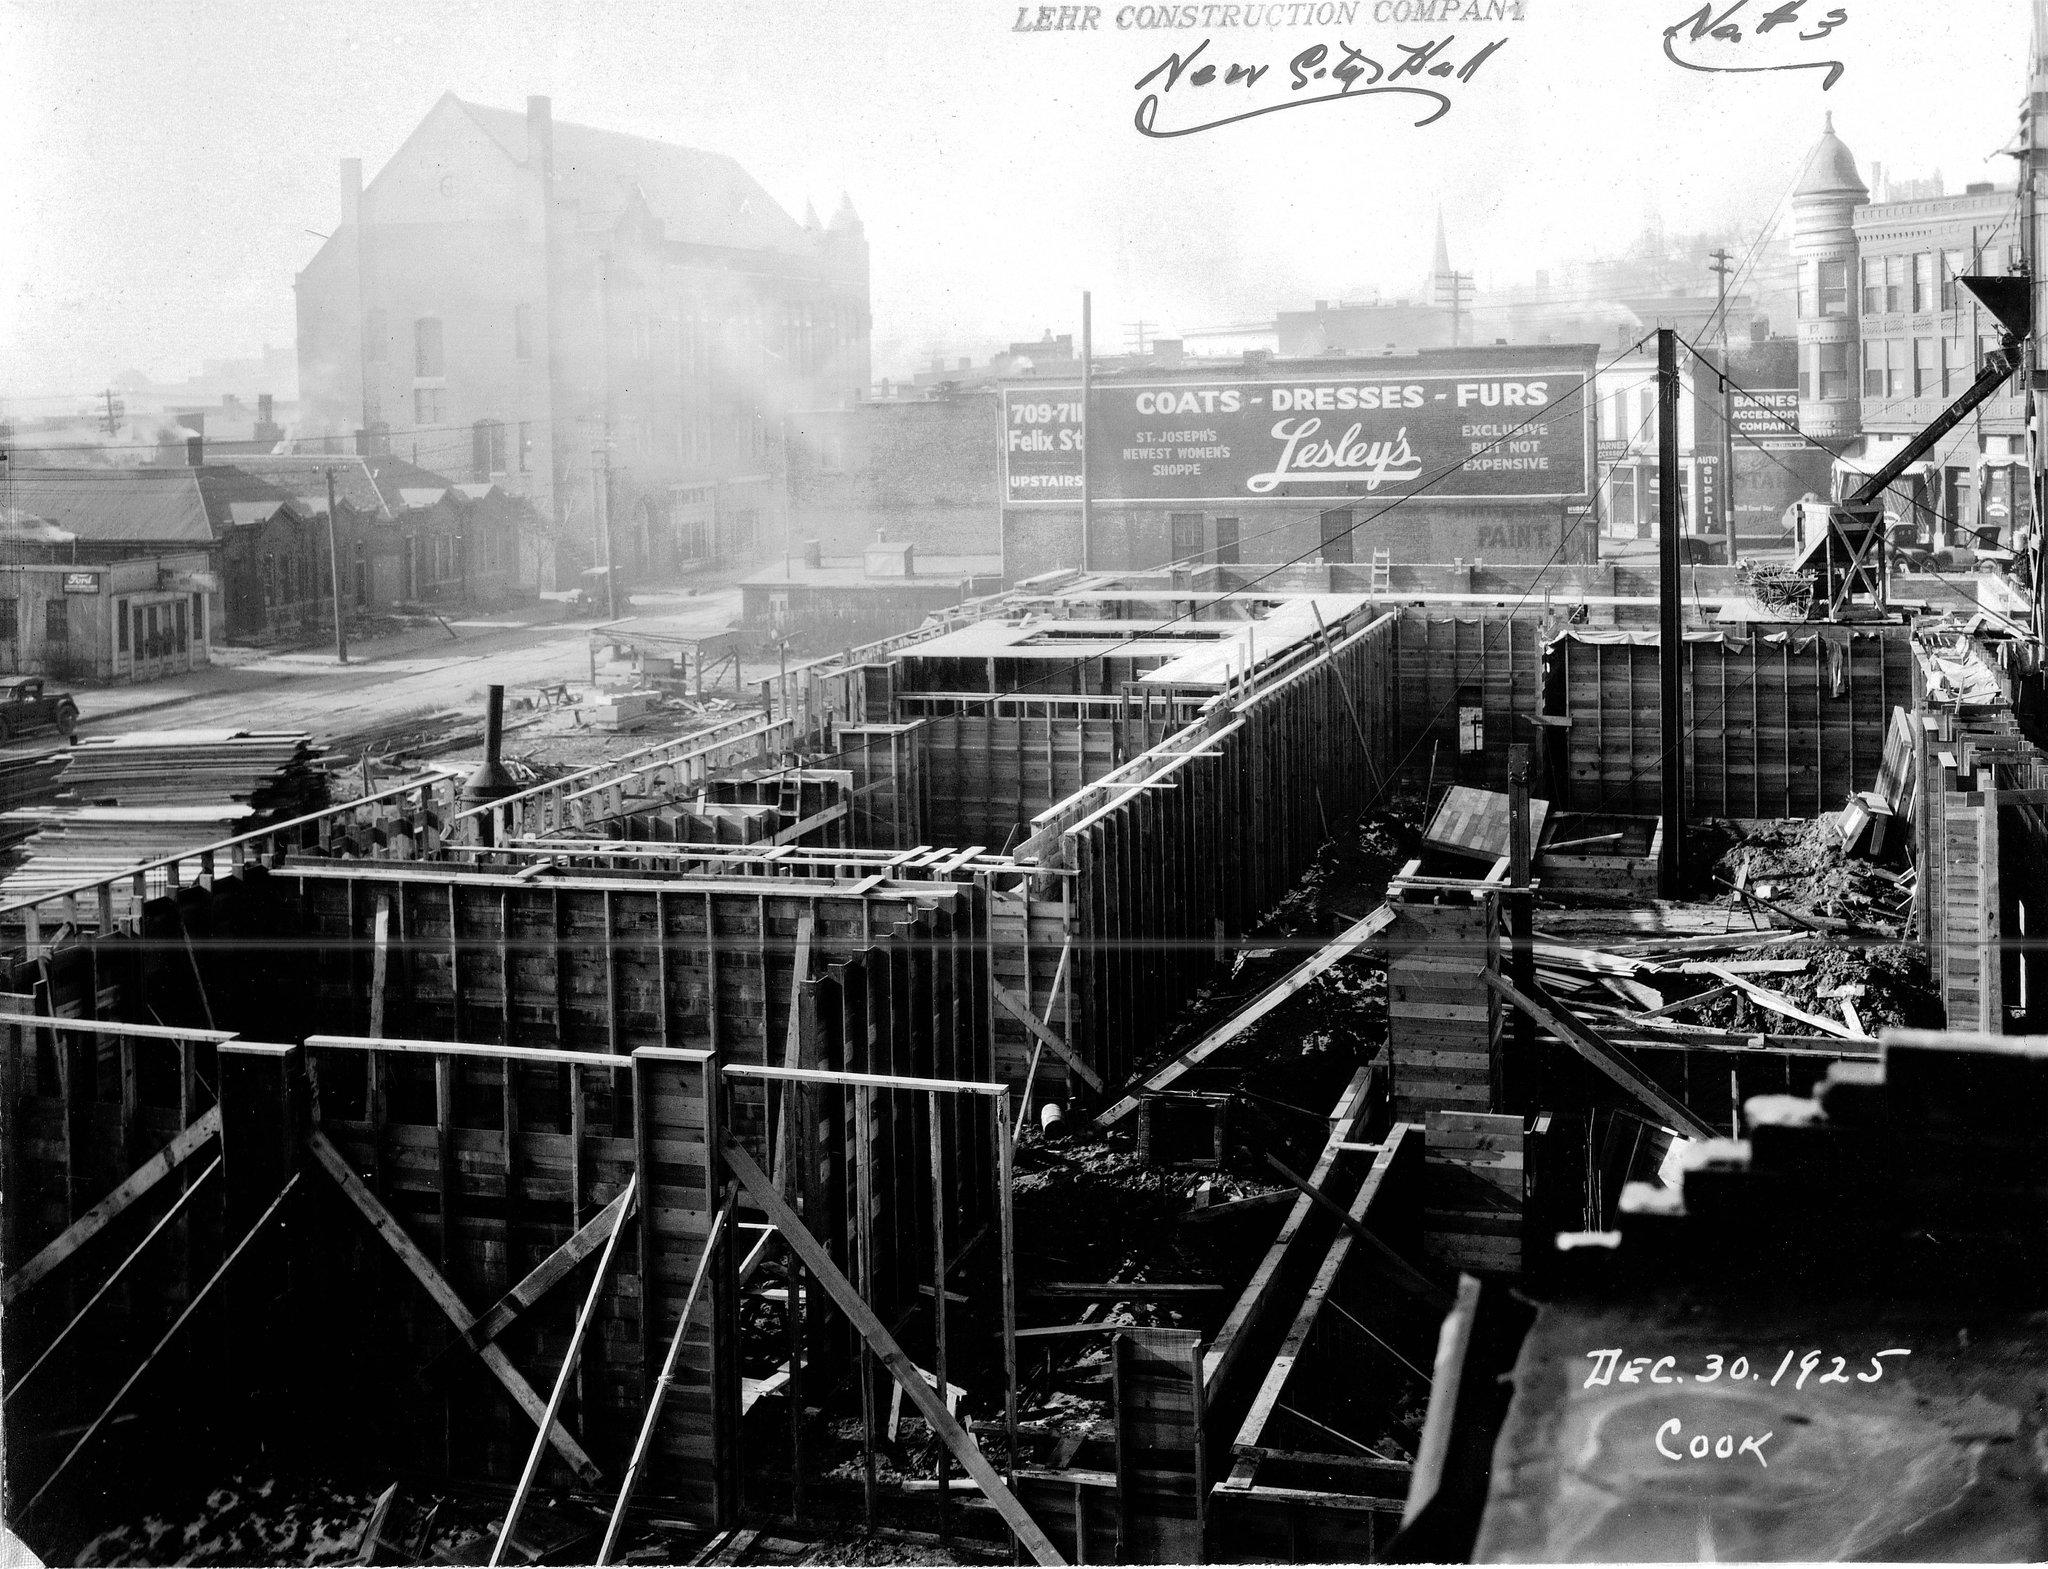 City Hall Early Contruction